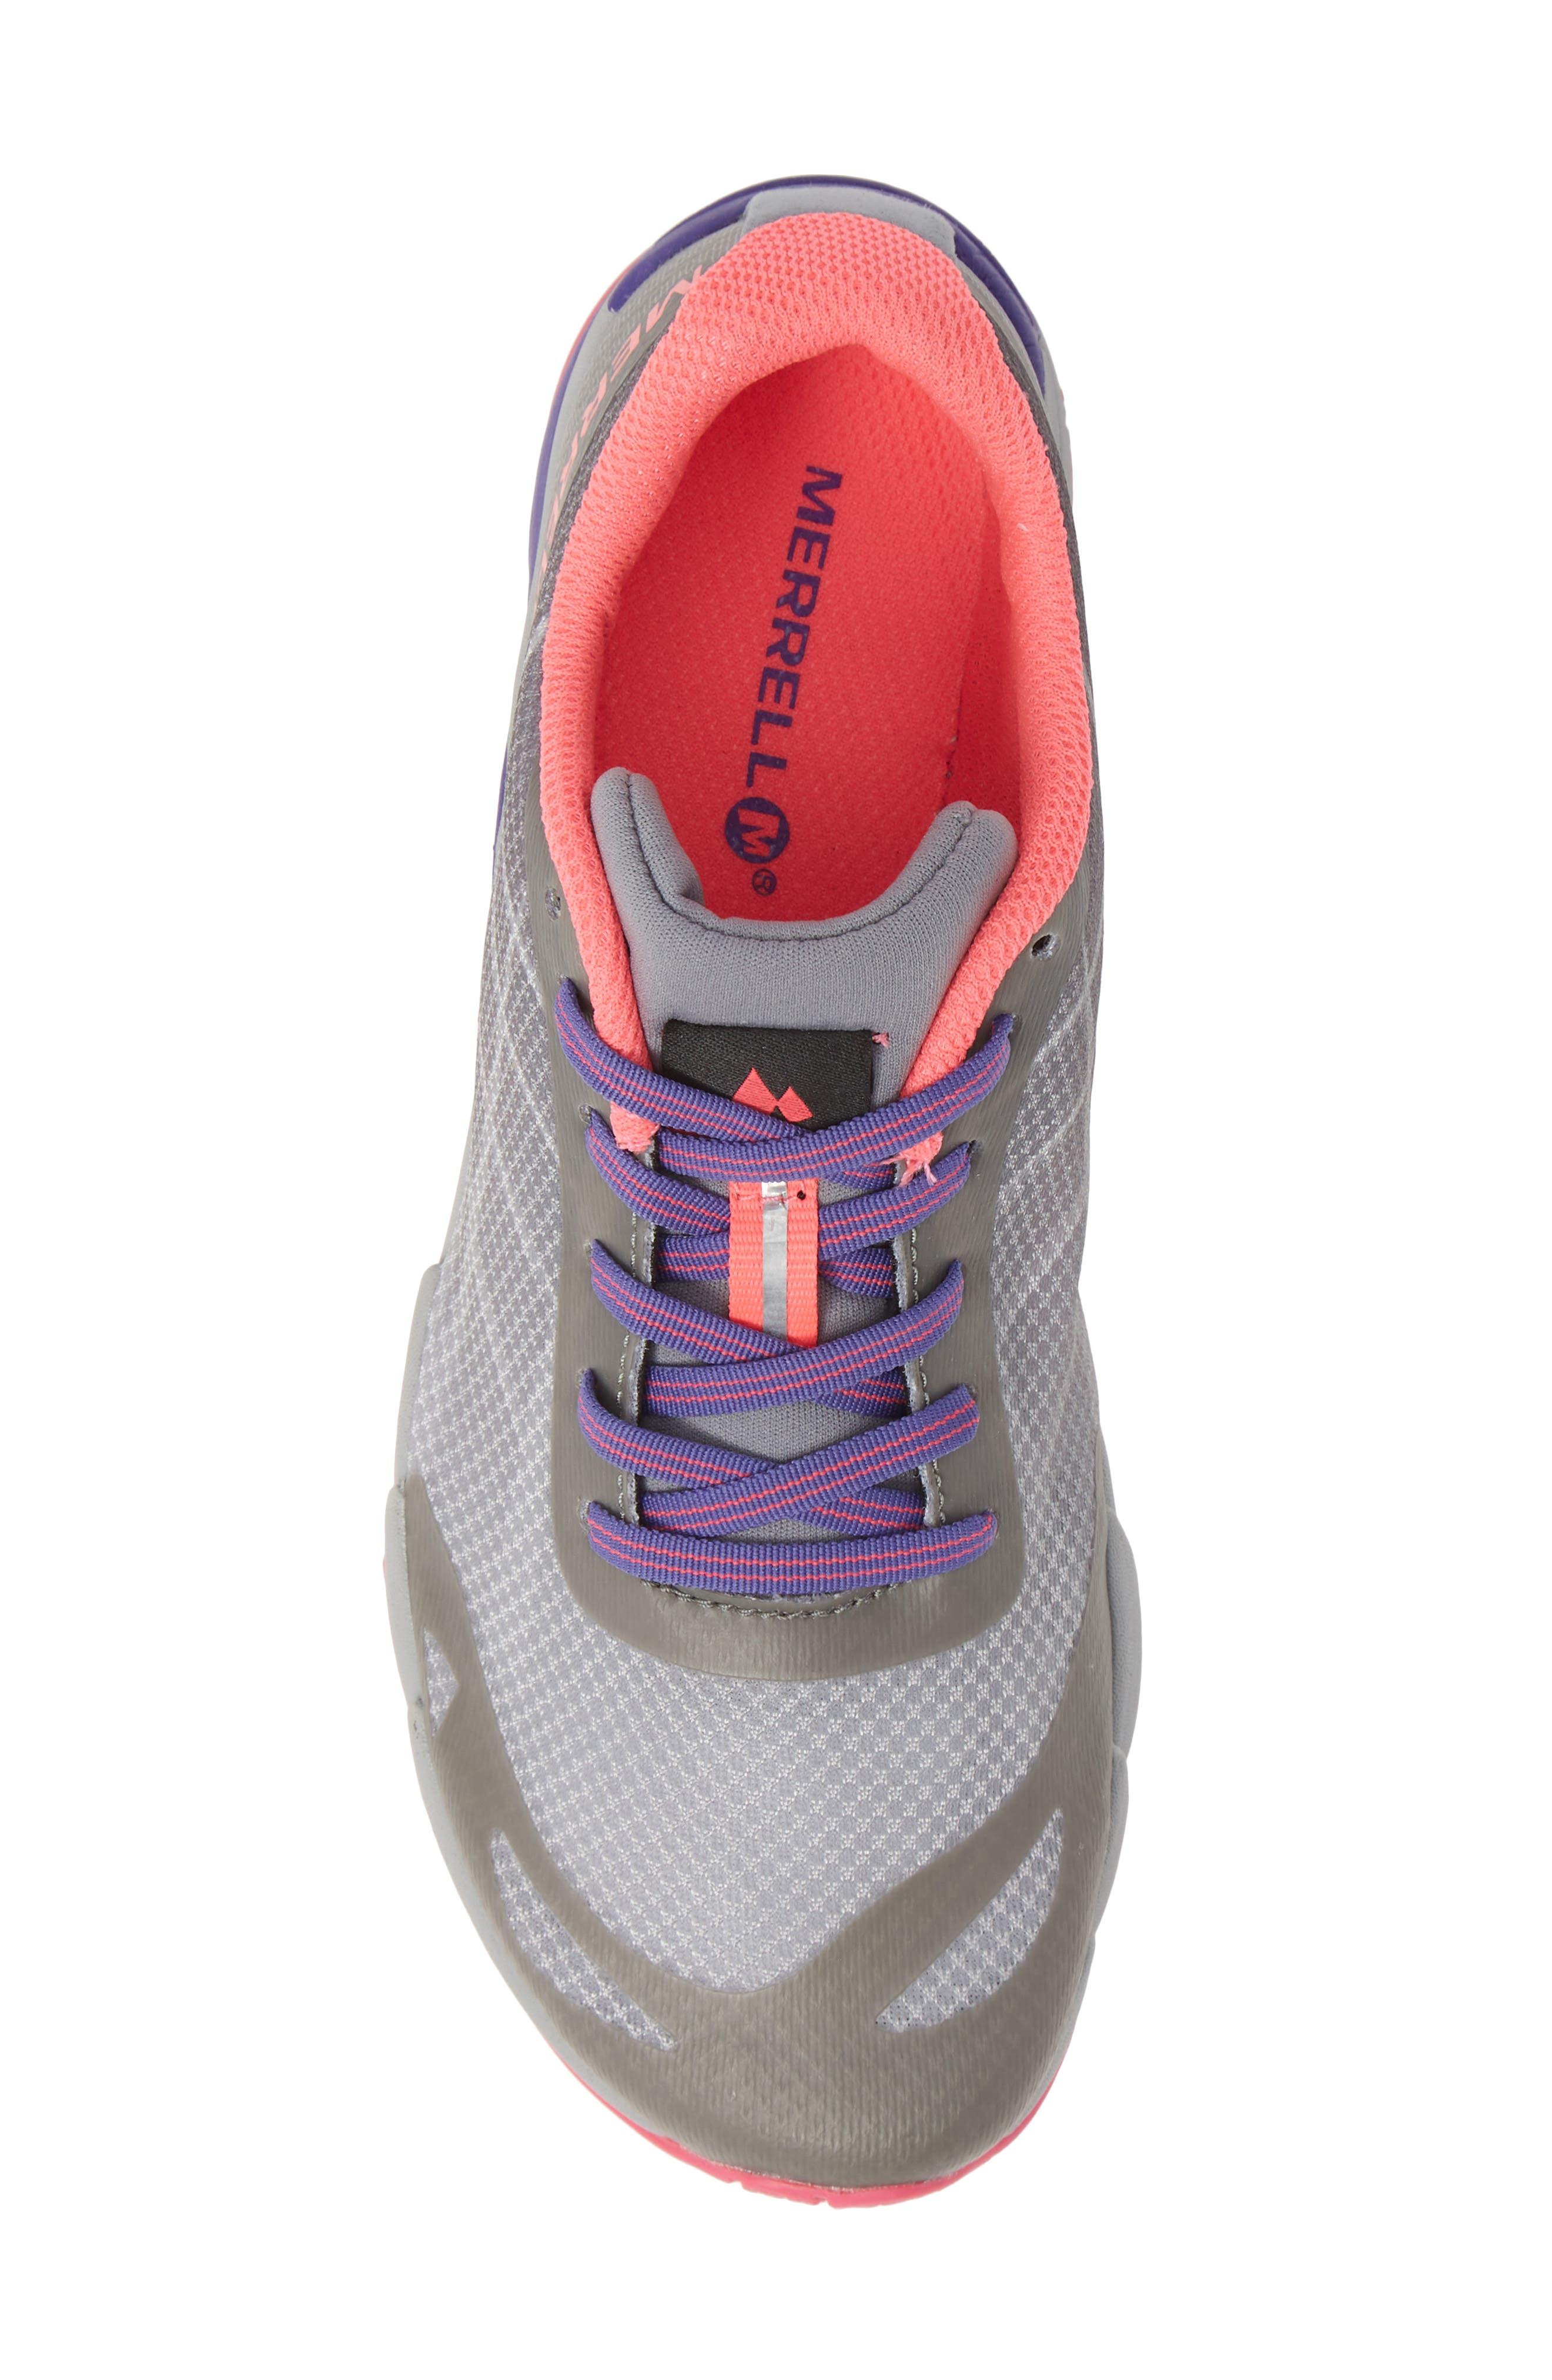 MERRELL, Bare Access Sneaker, Alternate thumbnail 5, color, GREY/ MULTI SYNTHETIC